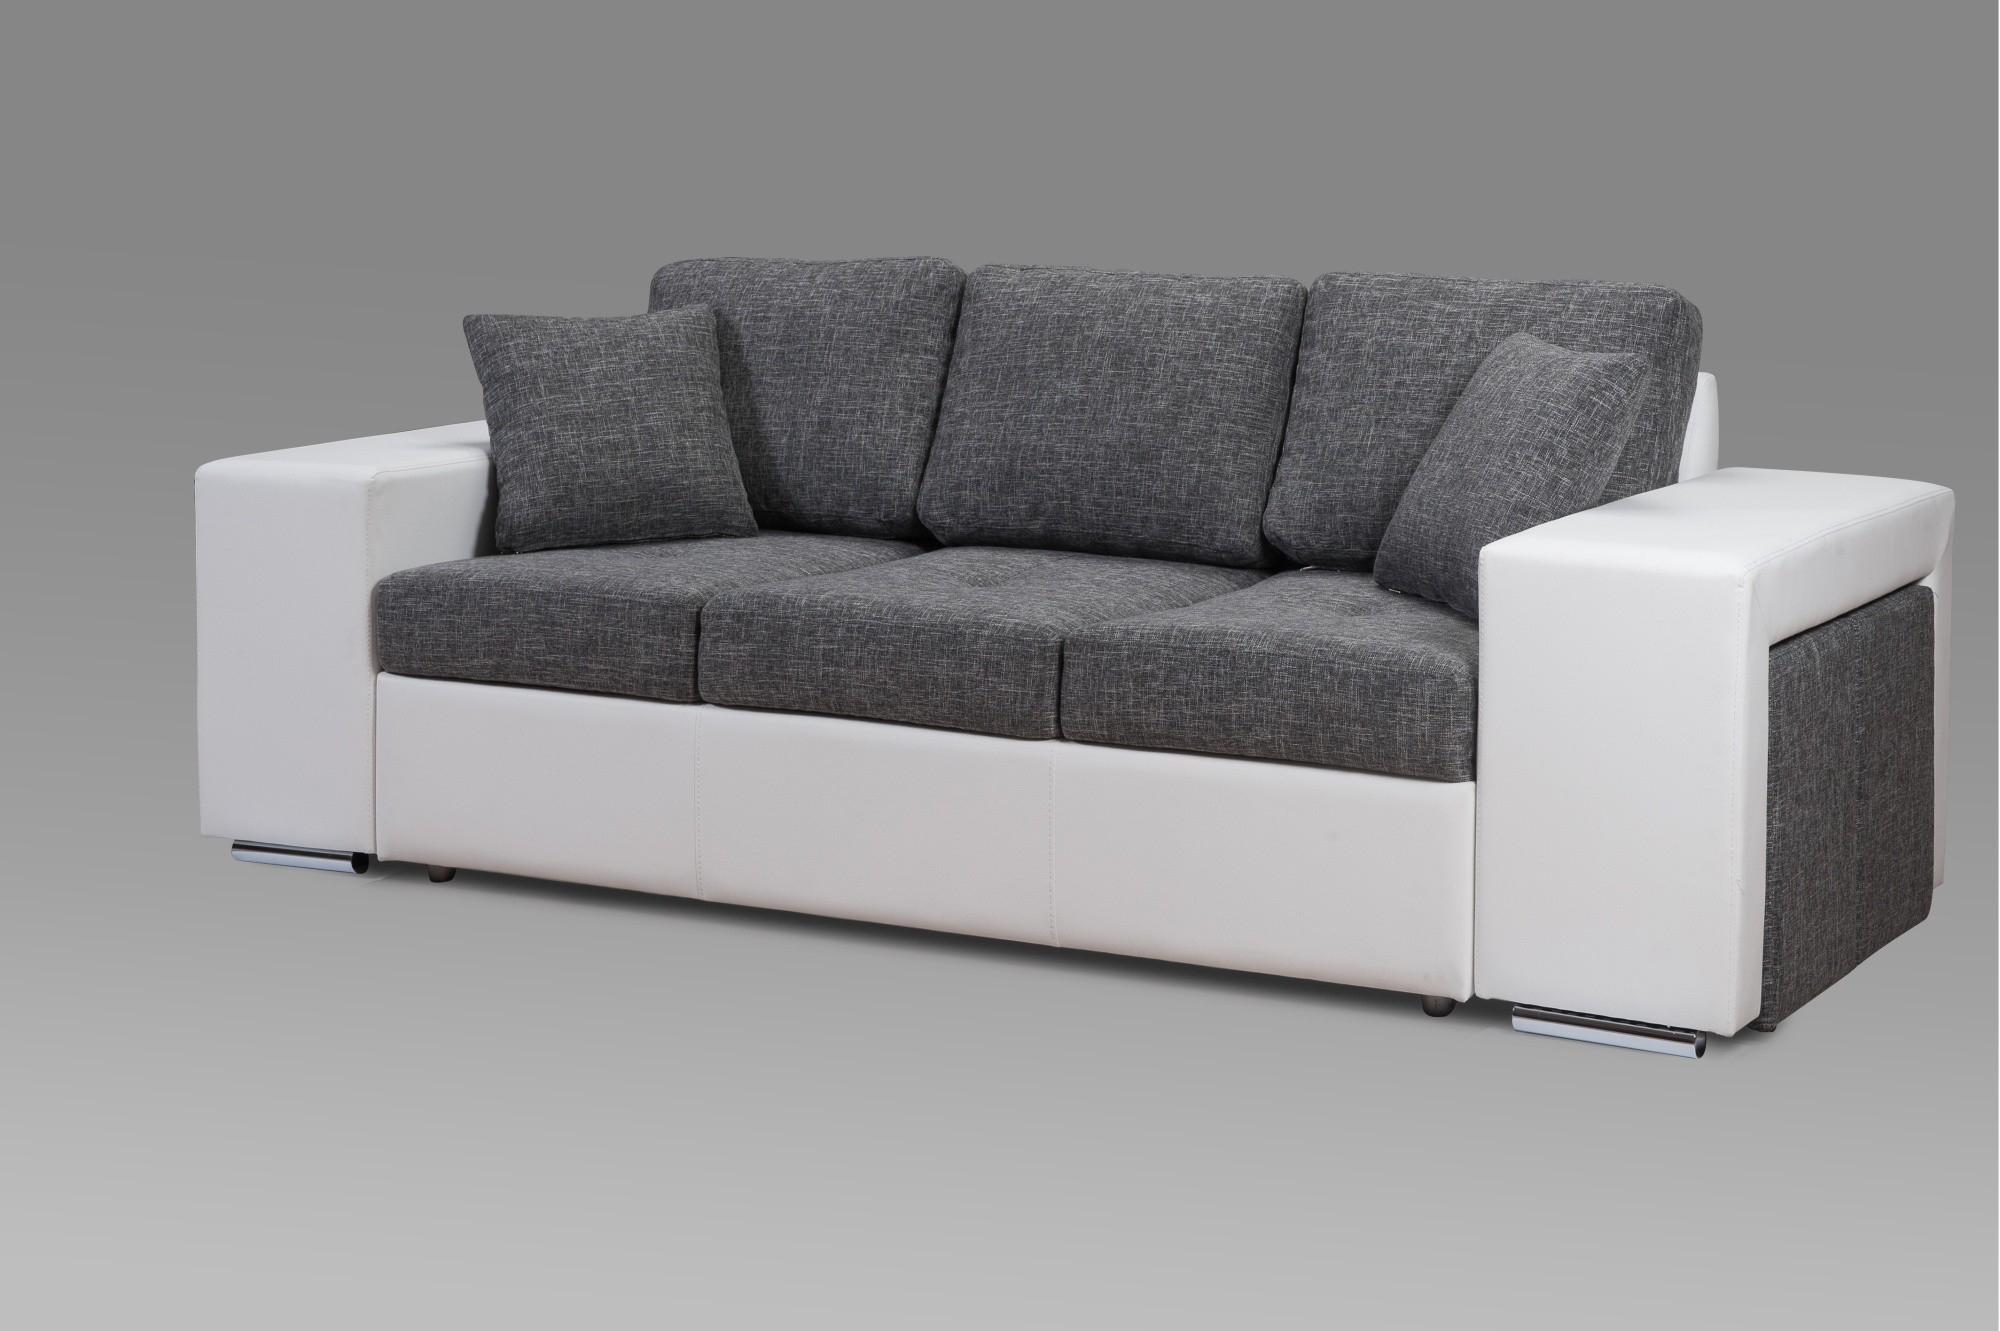 Canapé 4 Places Ikea Inspirant Stock Adslev